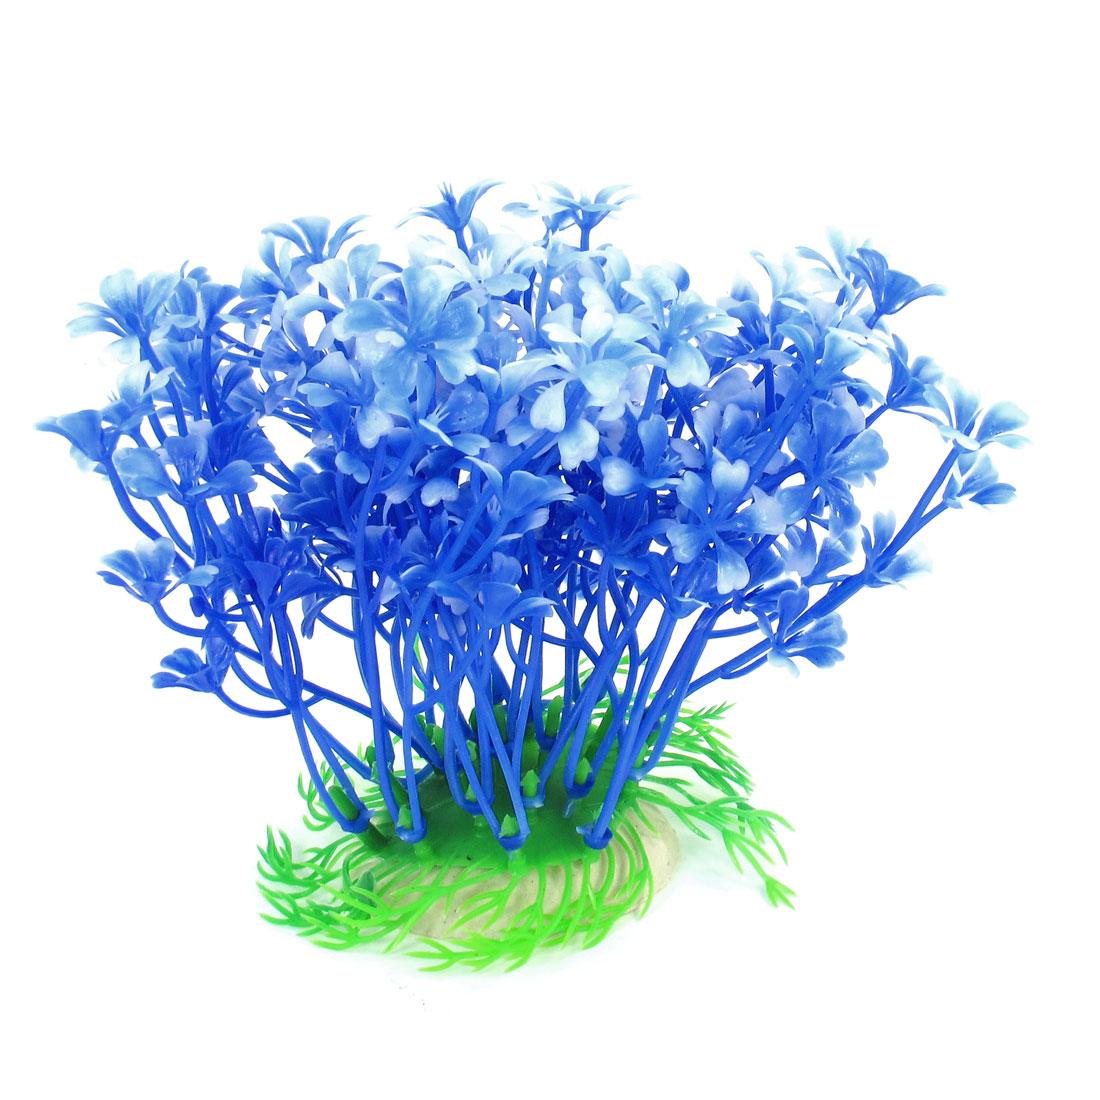 "Fish Tank Decor Aquascaping Emulational Water Plant Grass Blue White 4.5"" High"